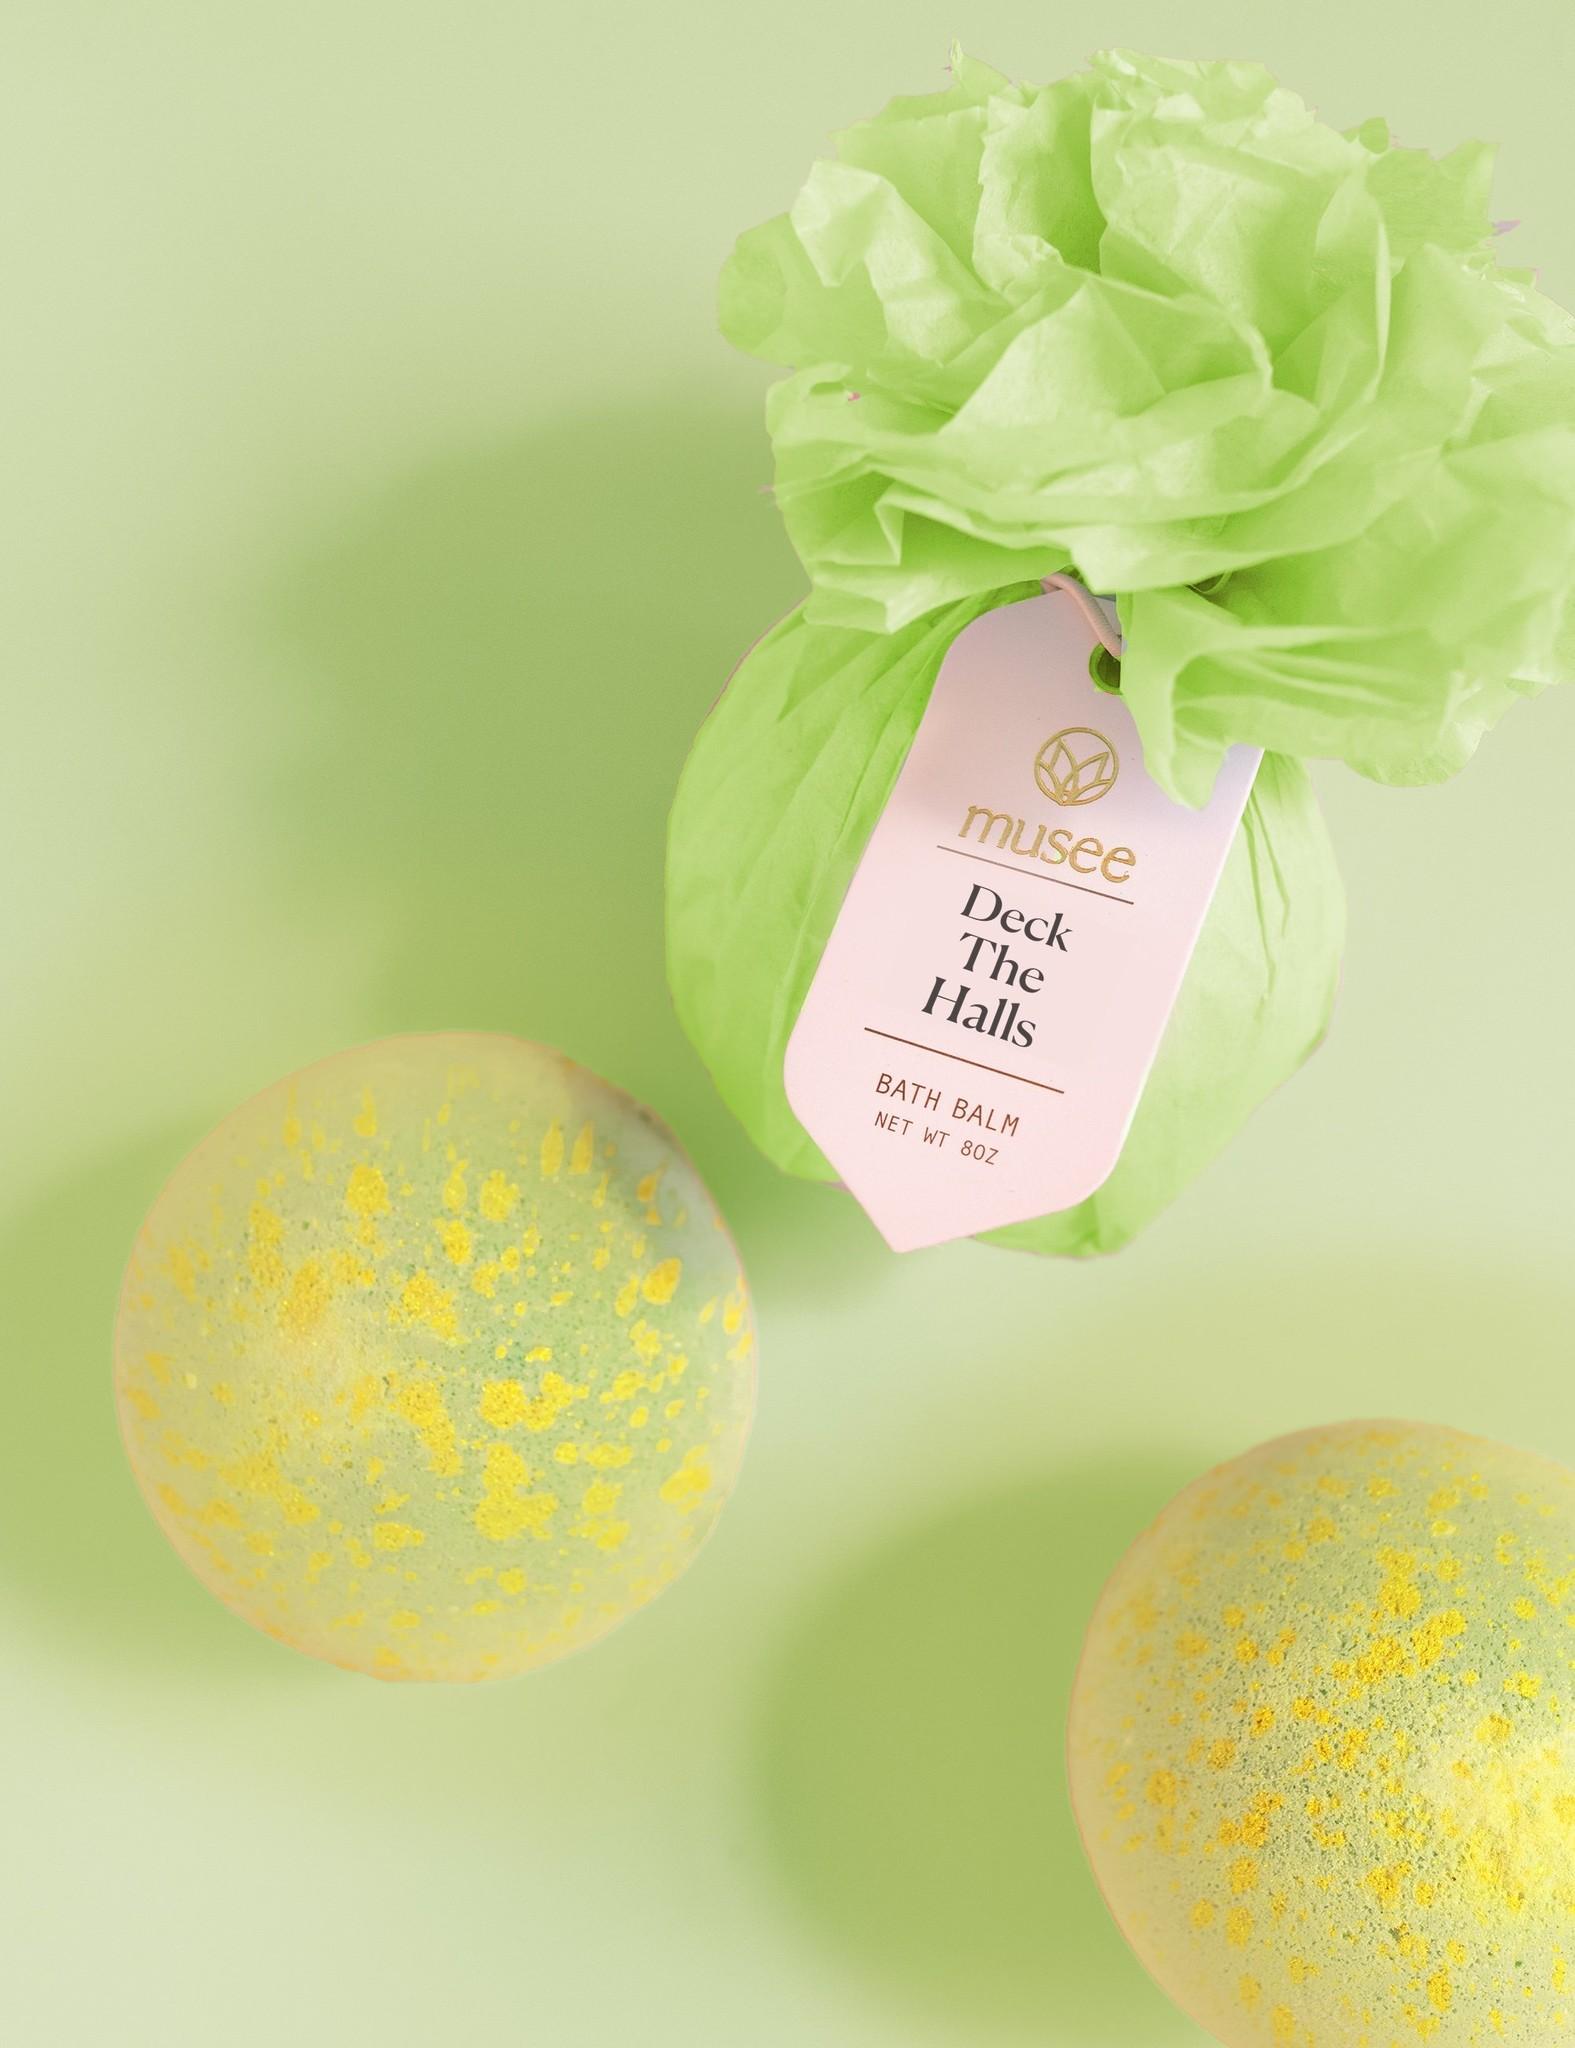 Musee Holiday Bath Balm Balls - Mutiple Flavors